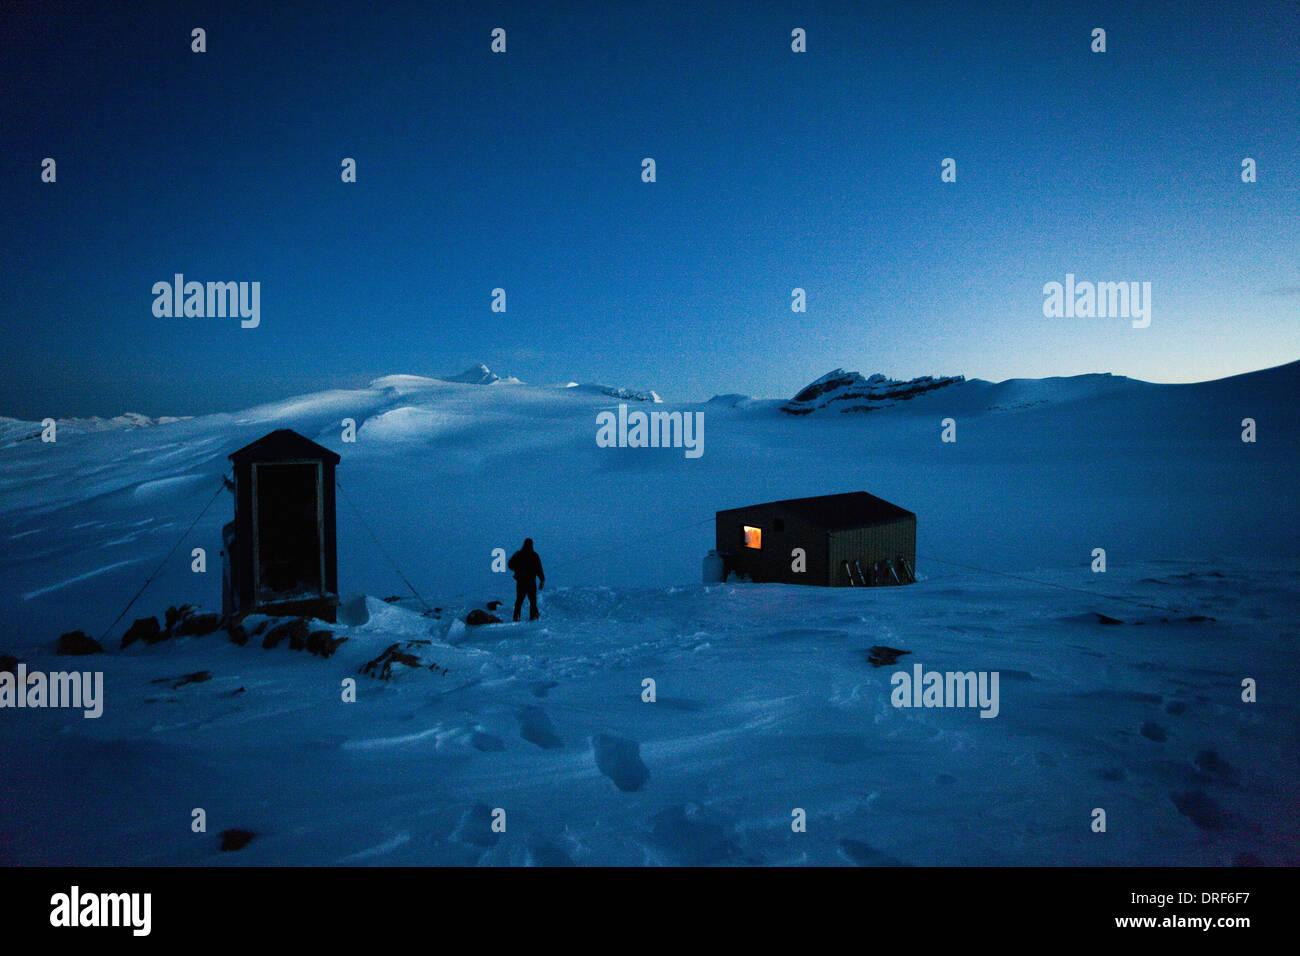 Alberta Canada. refuge on the Wapta Traverse hut-to-hut ski tour - Stock Image